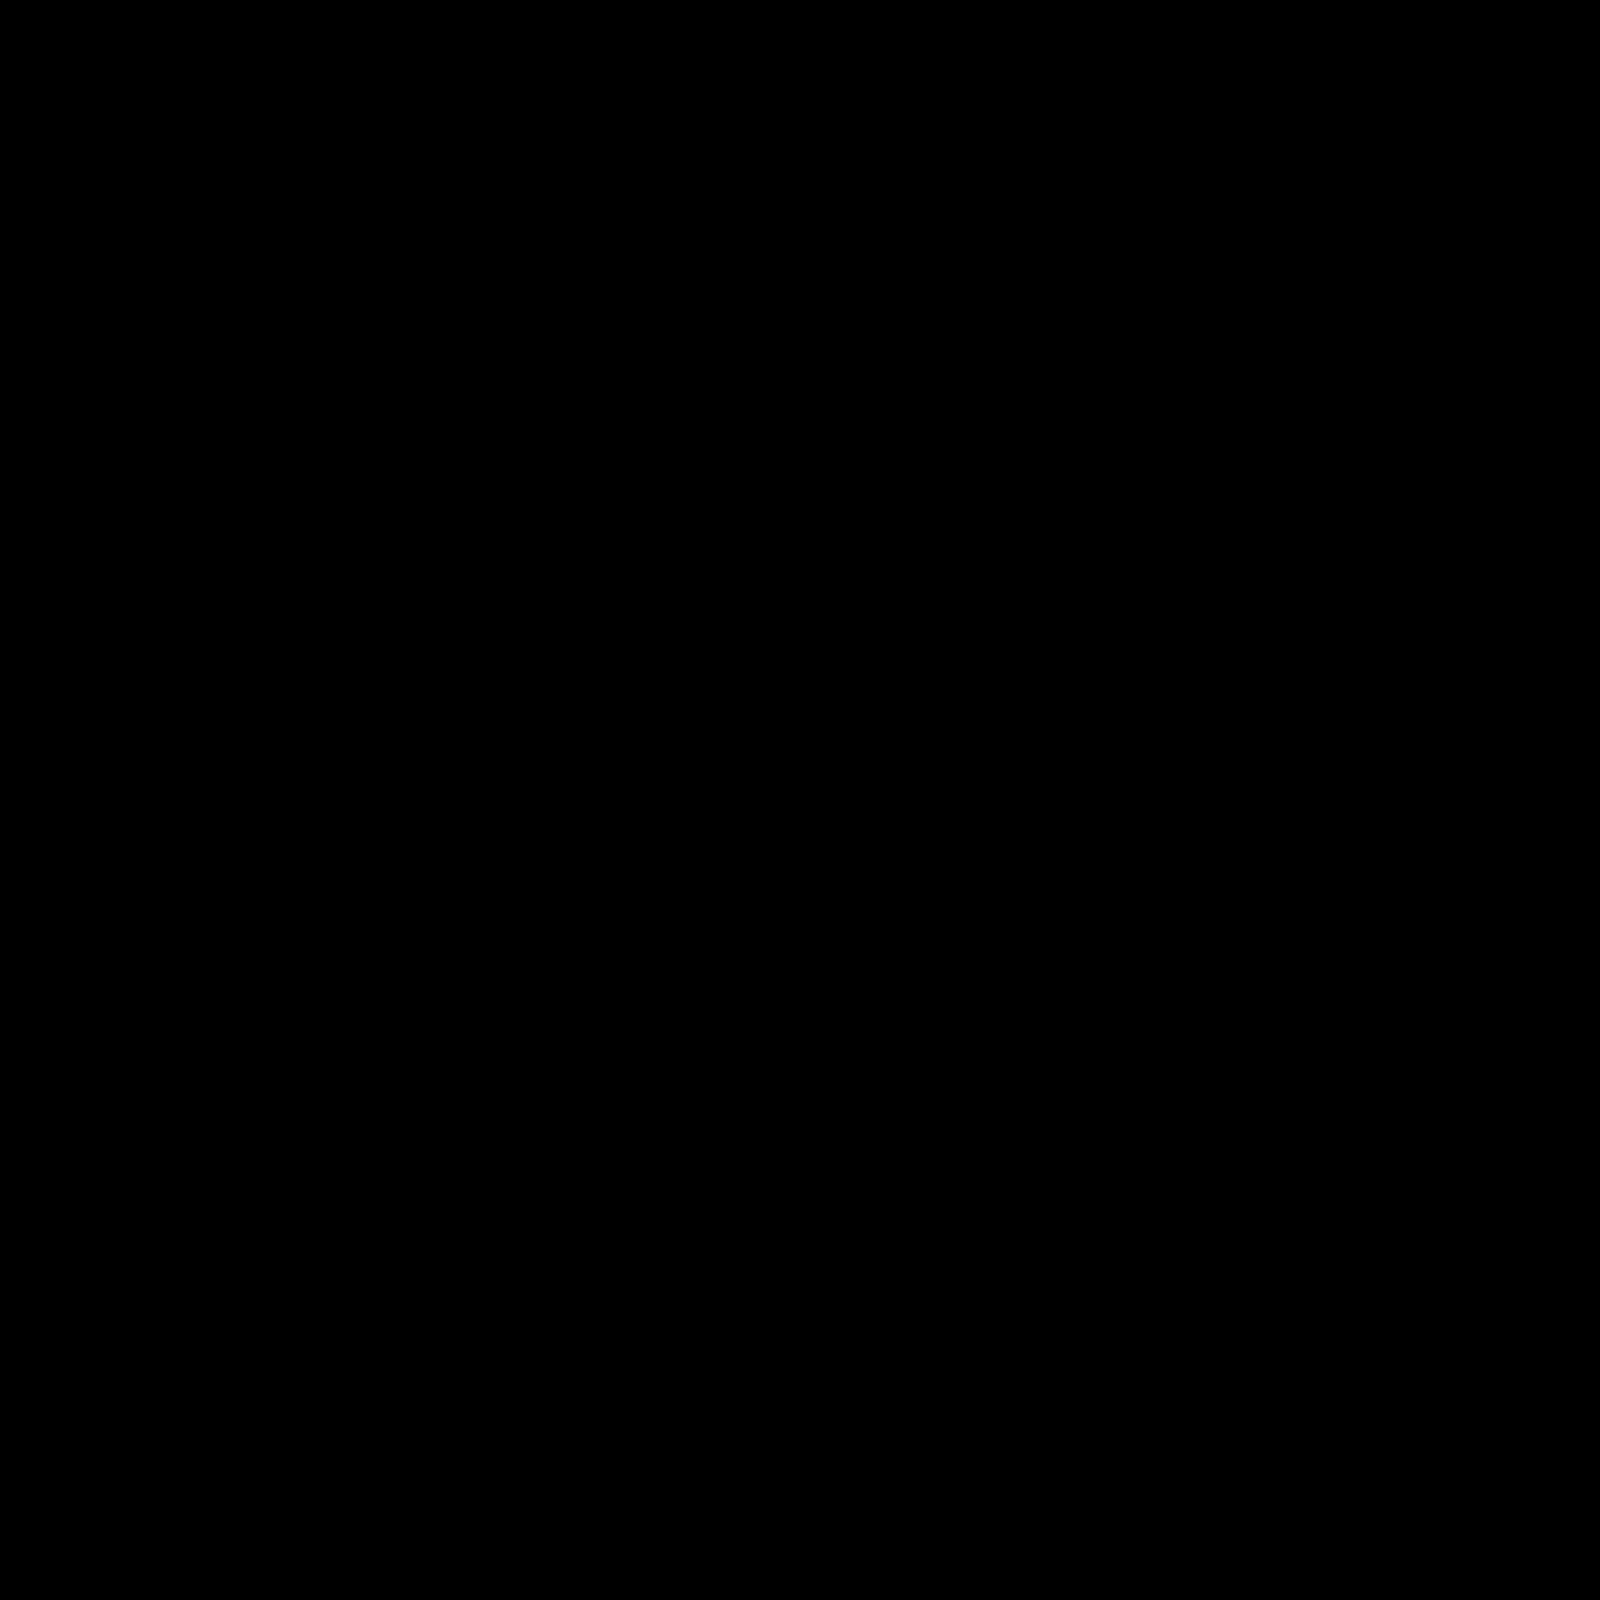 Apartamento icon